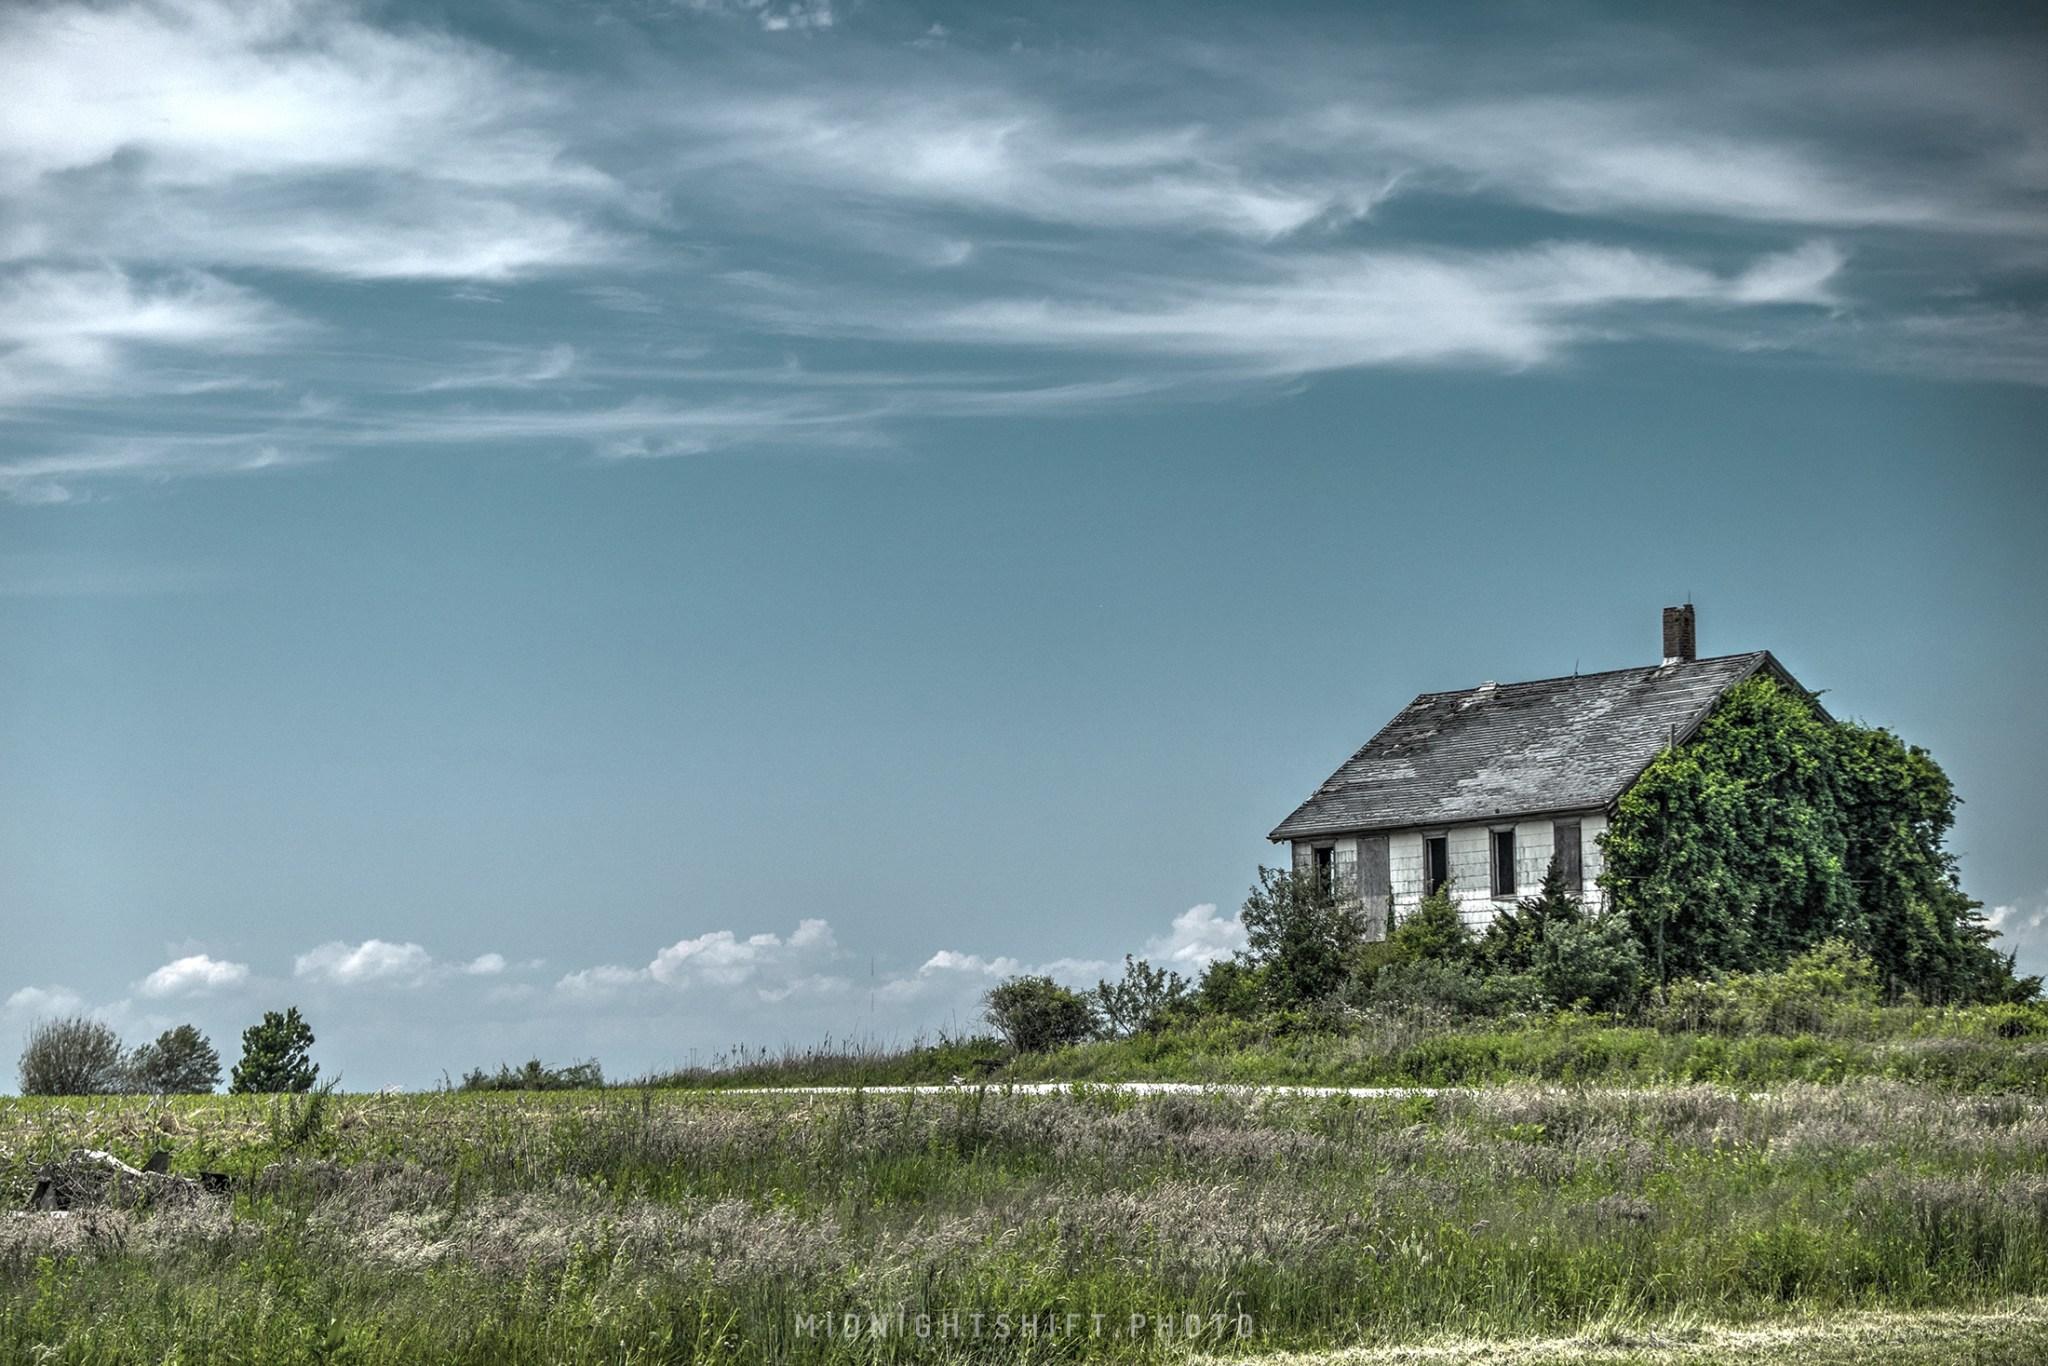 An old farmhouse in Westport, MA.